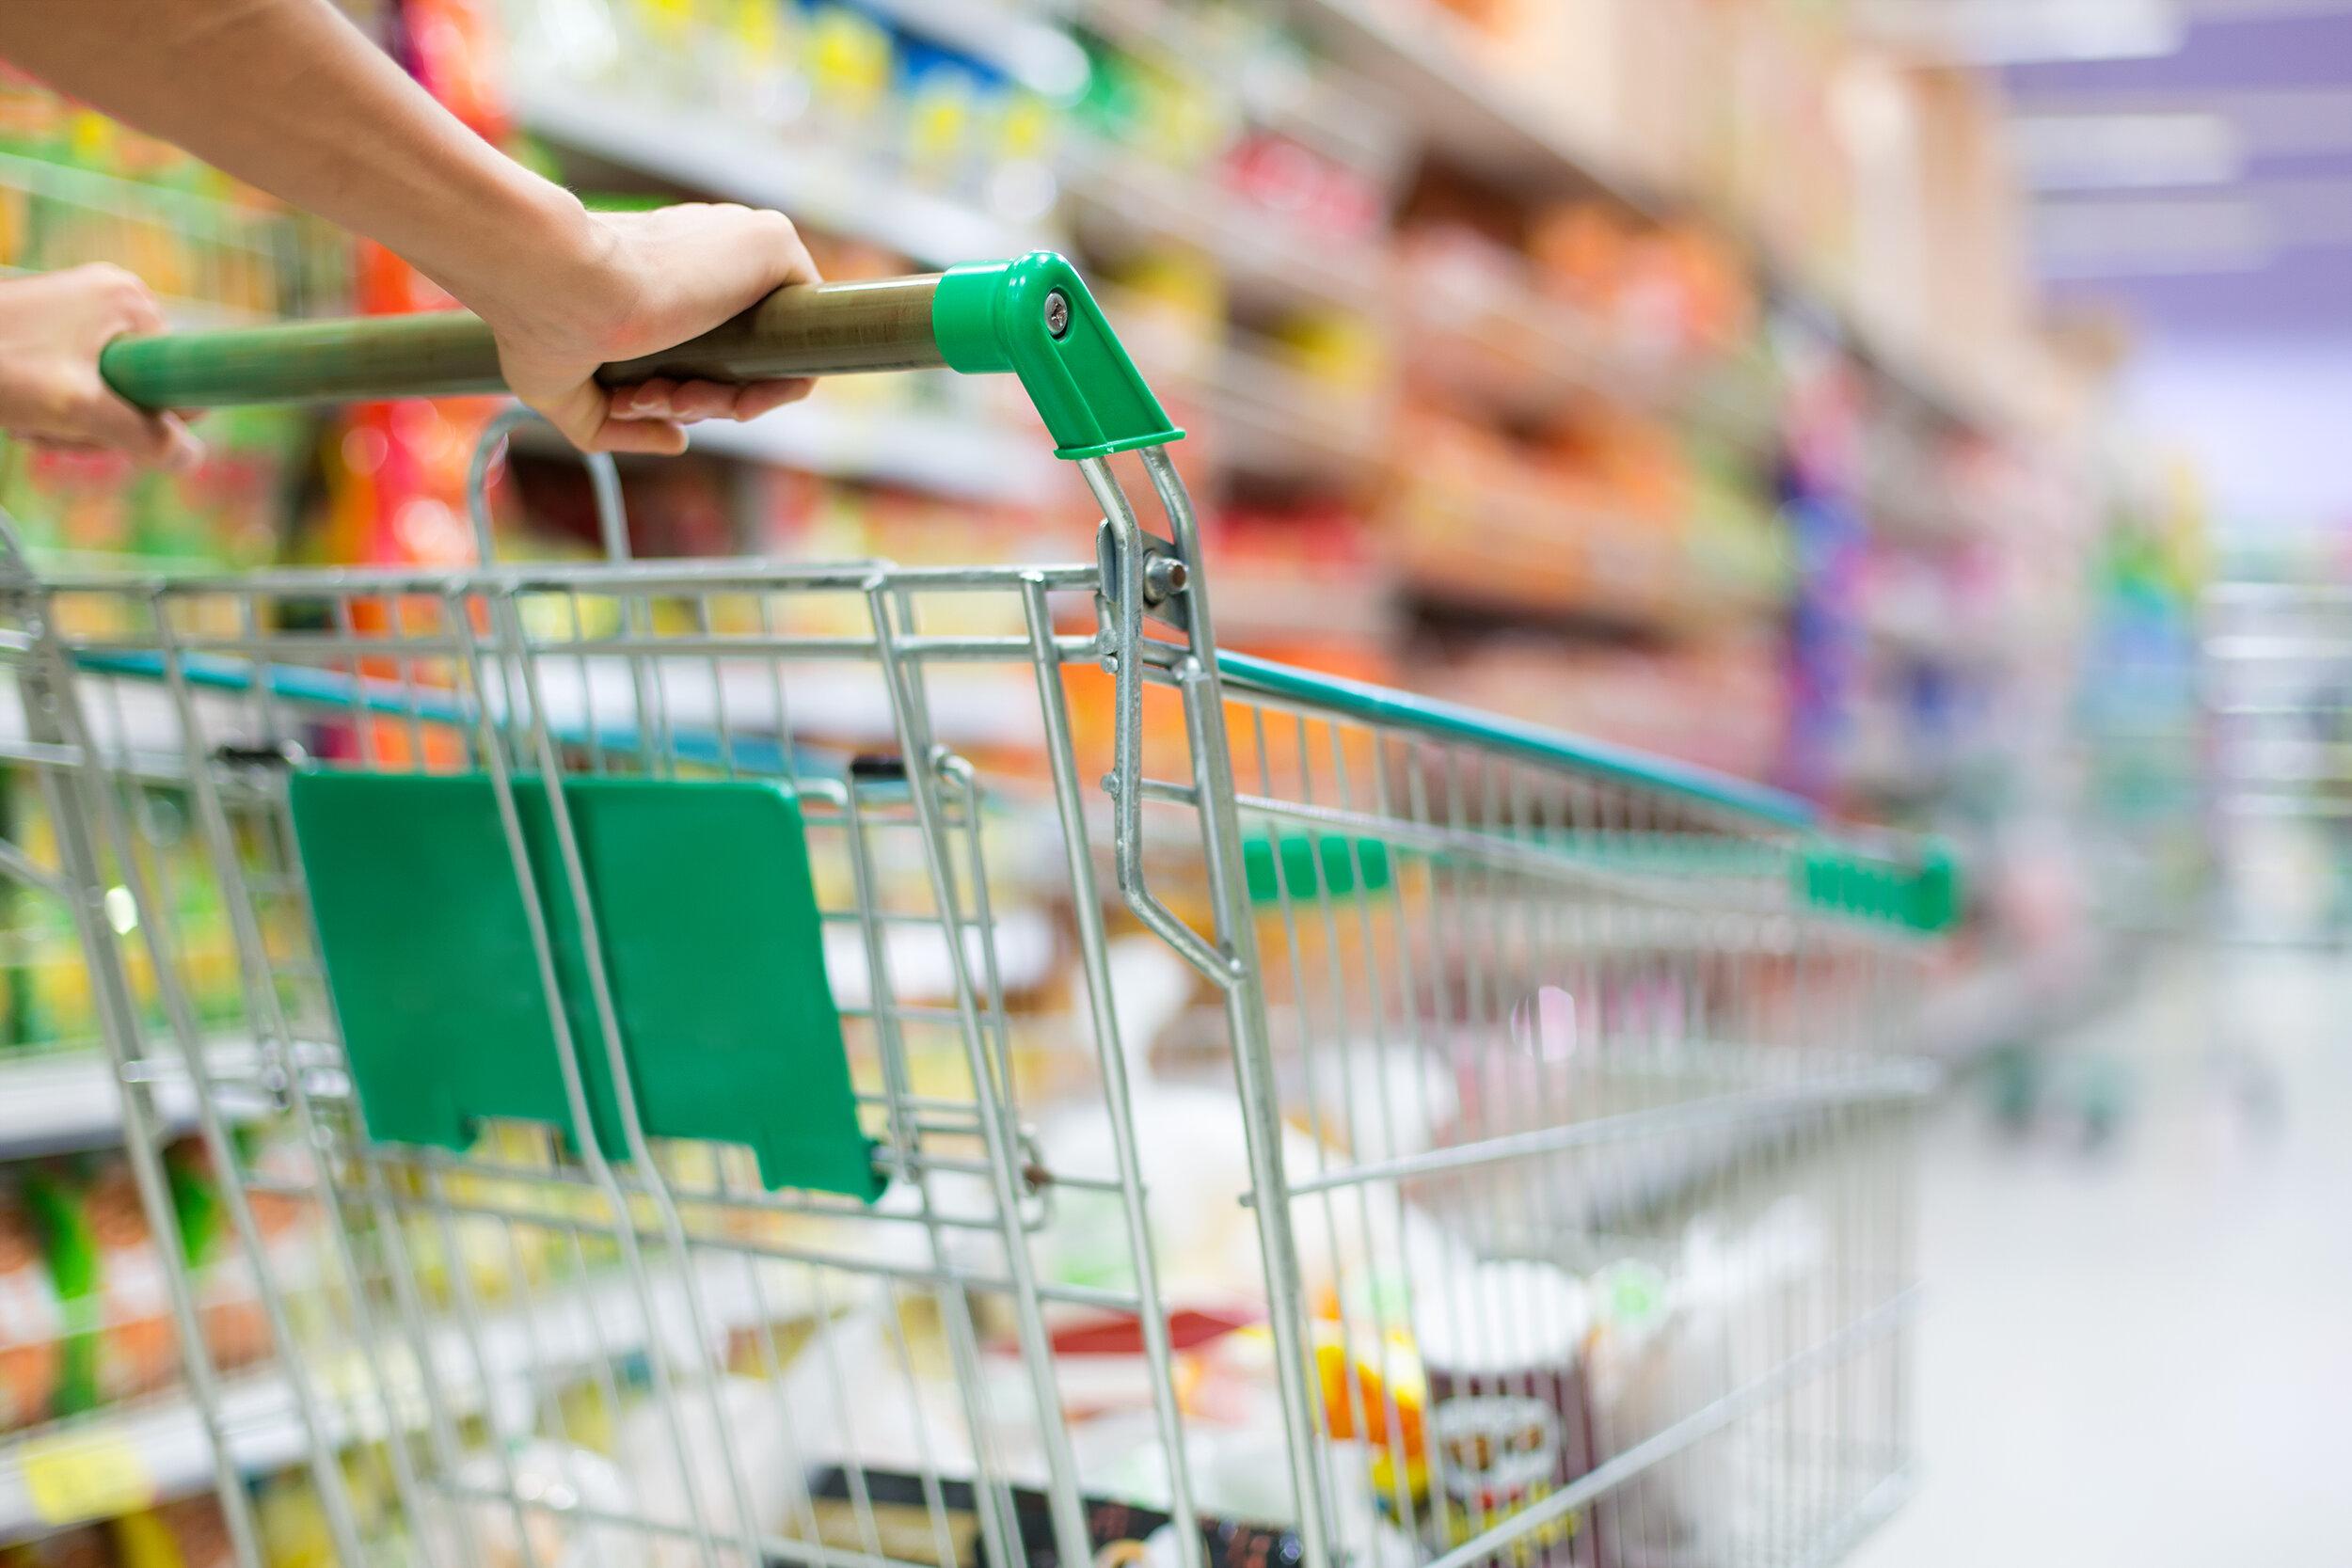 rabais-économie-épicerie-menu-de-la-semaine-IGA-Super C-Métro-Provigo